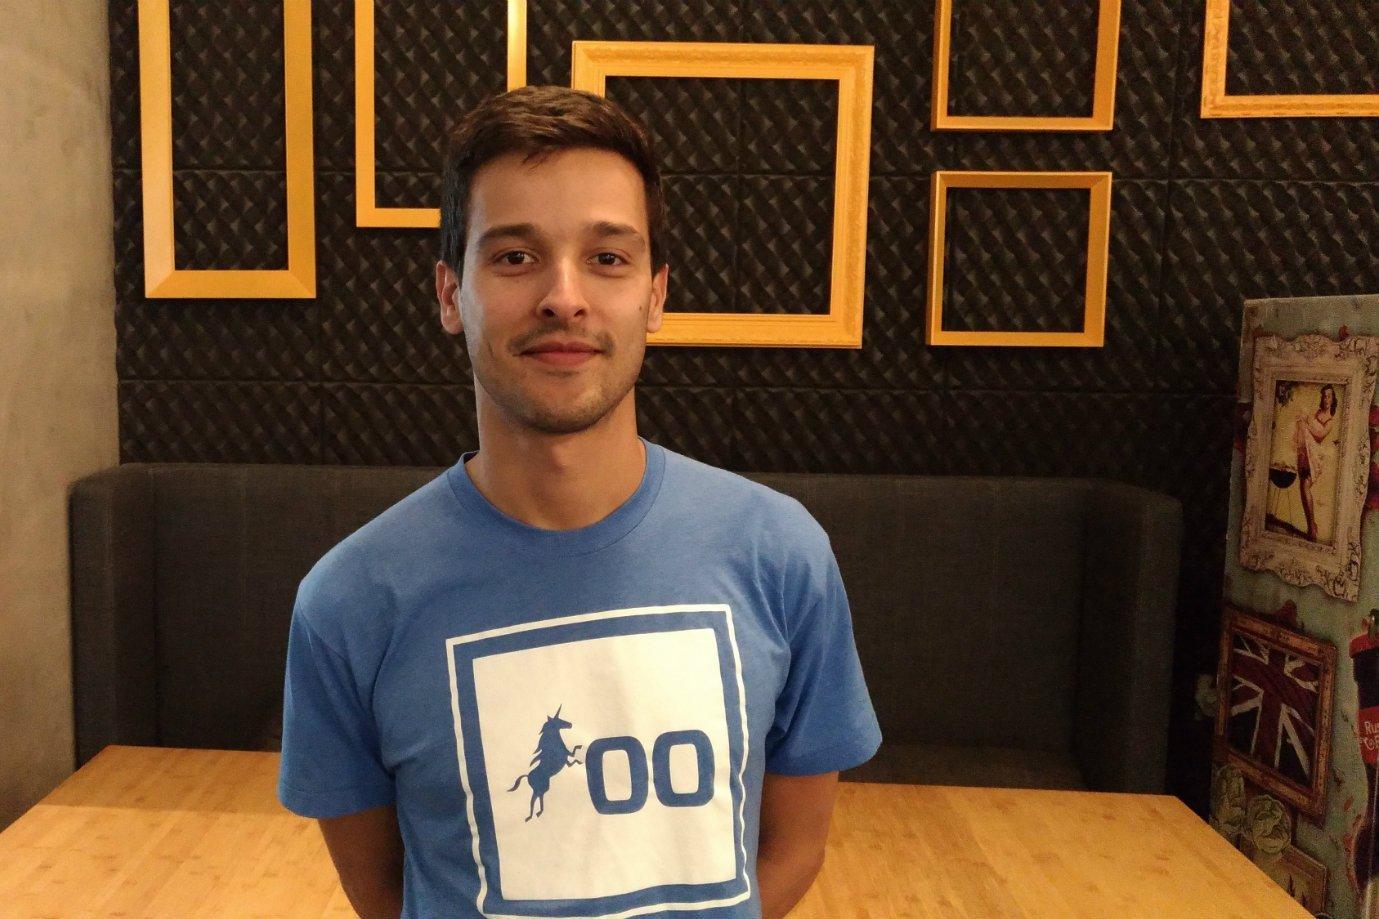 Rodolfo Pinotti, da 500 Startups